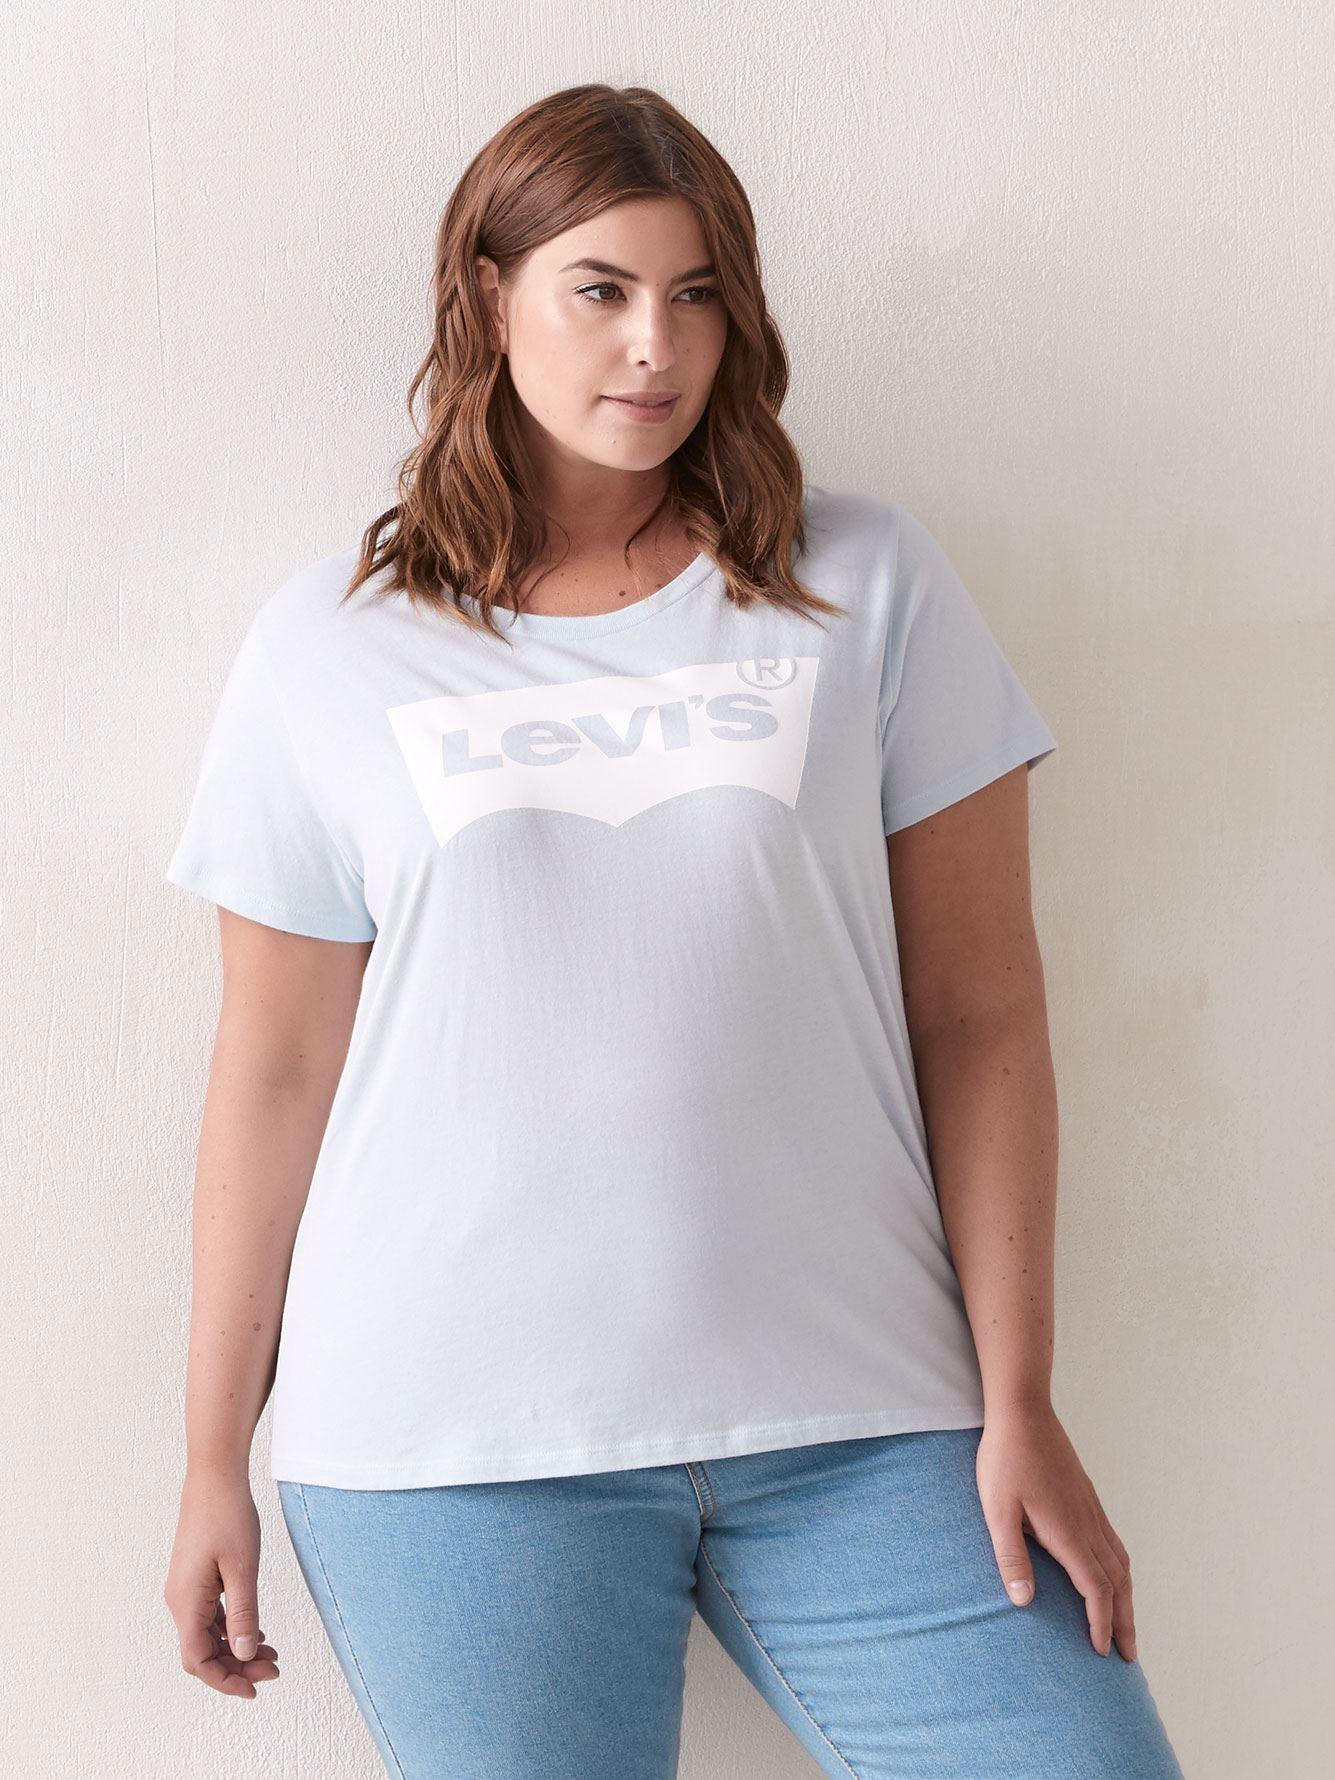 Perfect Batwing Logo T-Shirt - Levi's Premium